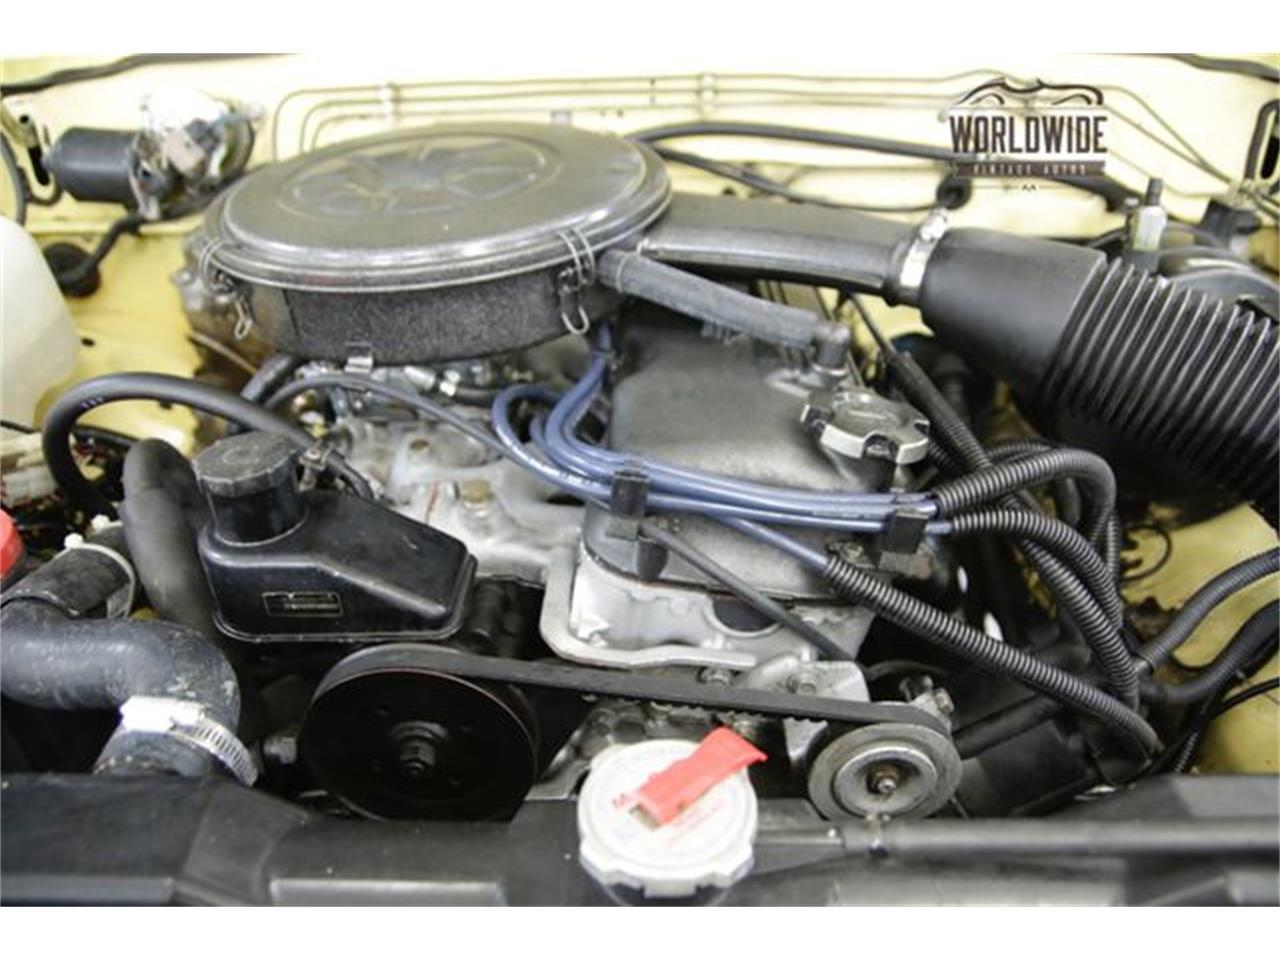 1985 nissan 720 carburetor adjustment